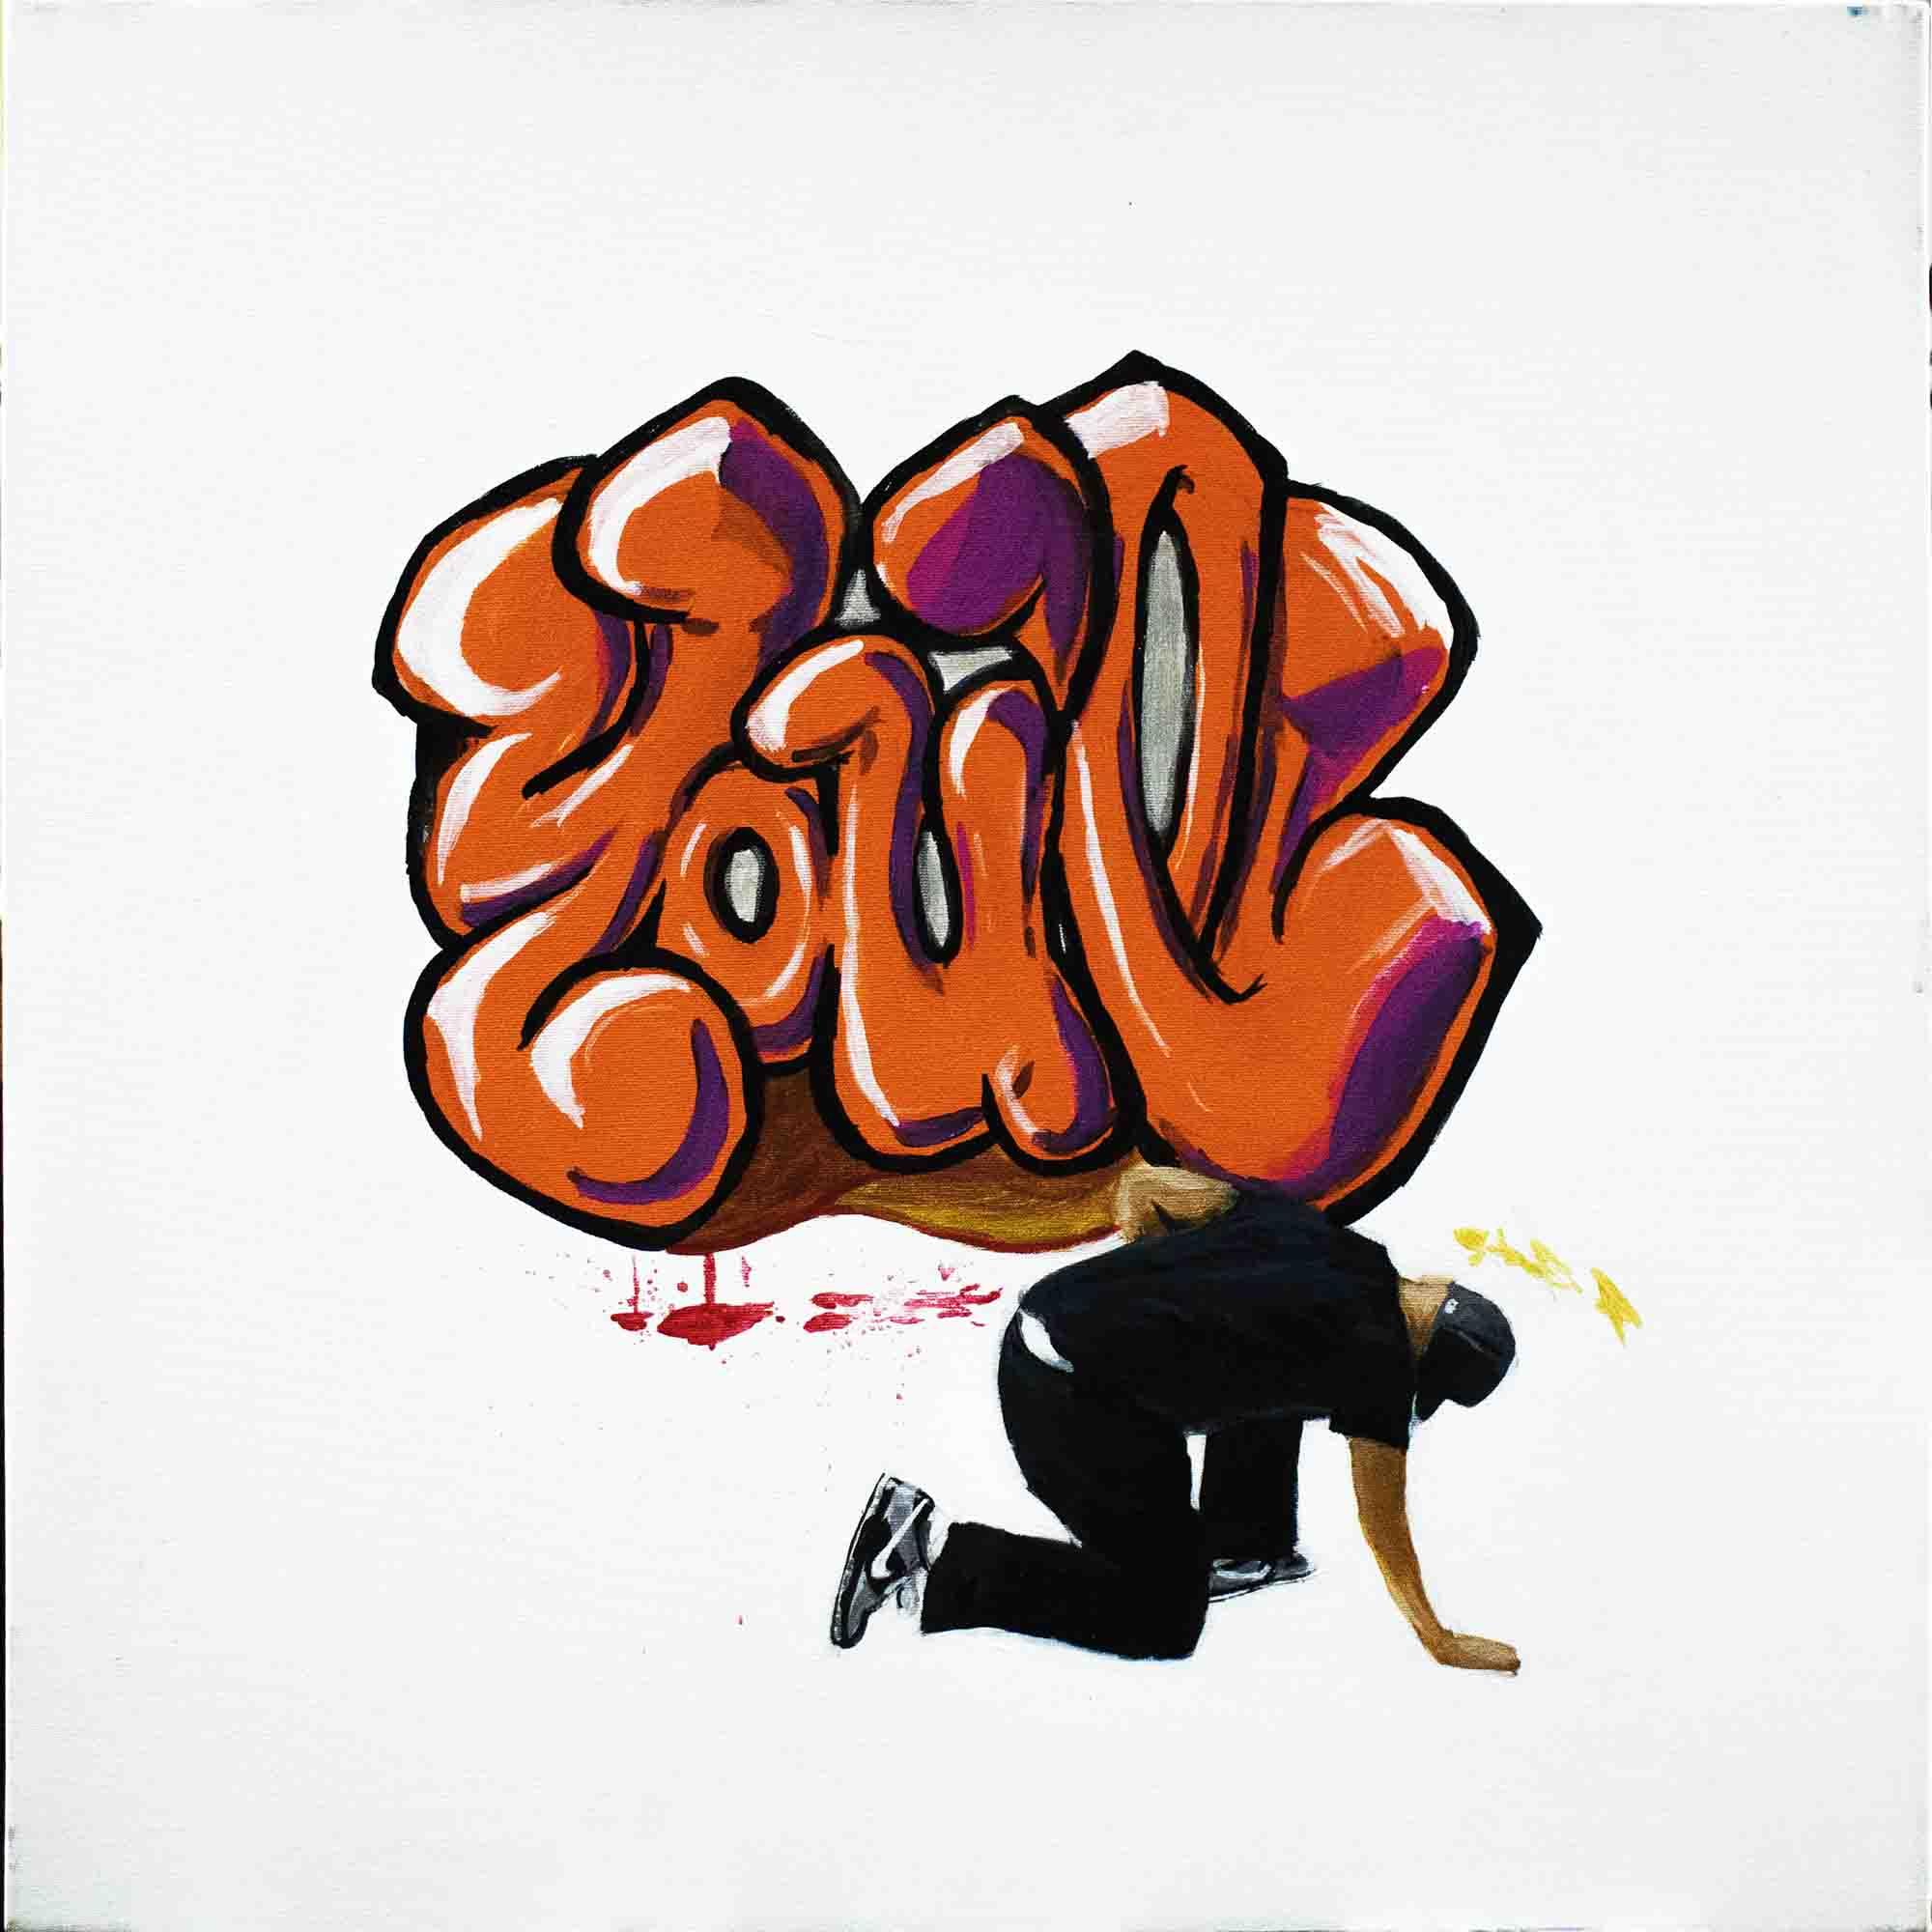 Super-Saturated pseudo-Graffiti - left